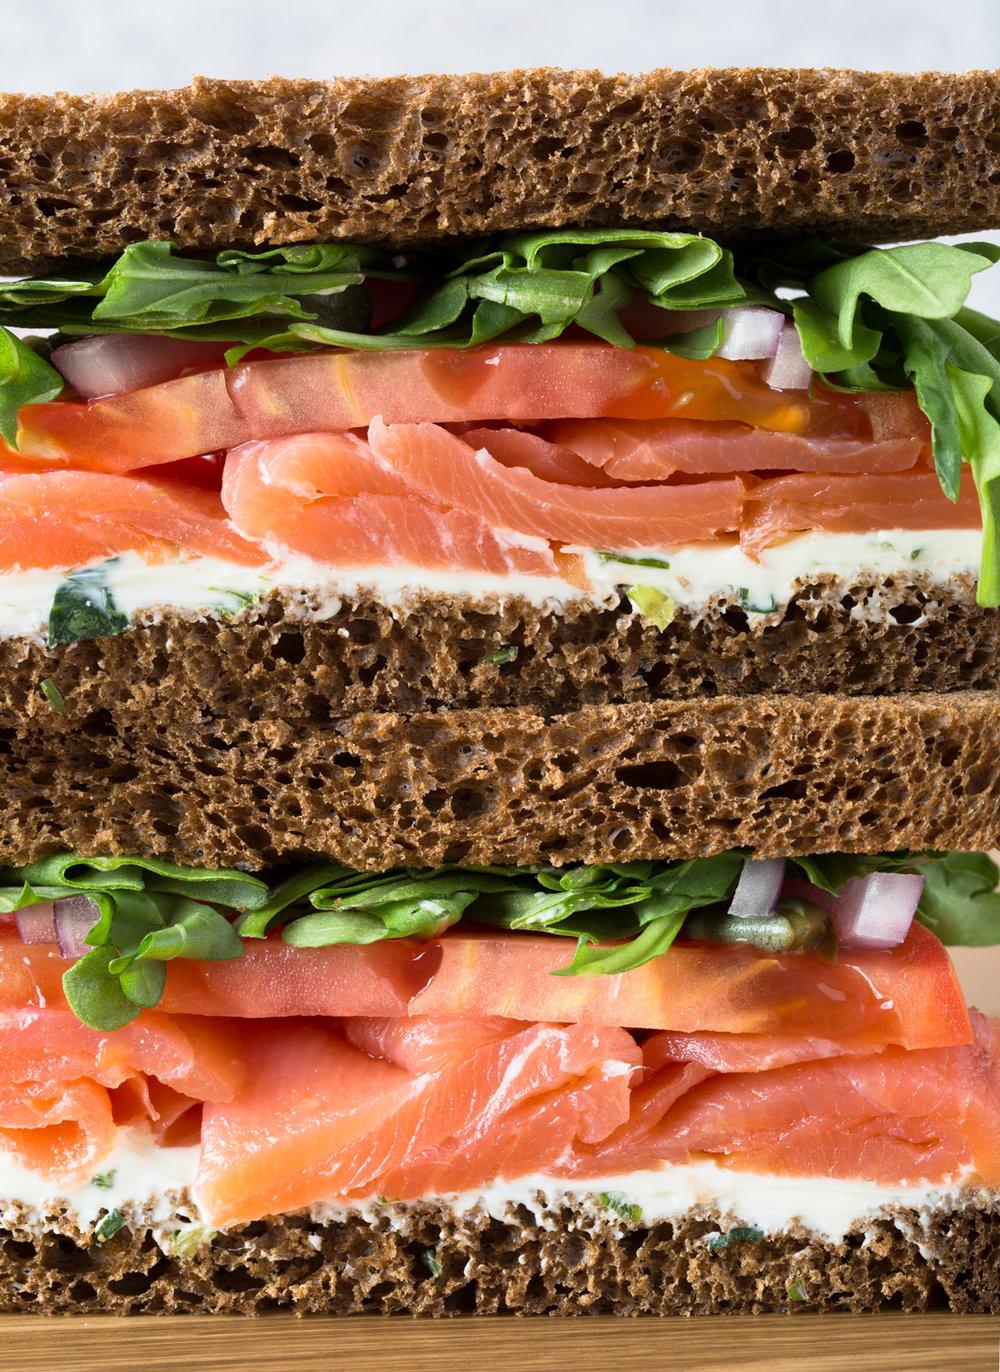 181212_RevHall_Food-sandwich-1.jpg